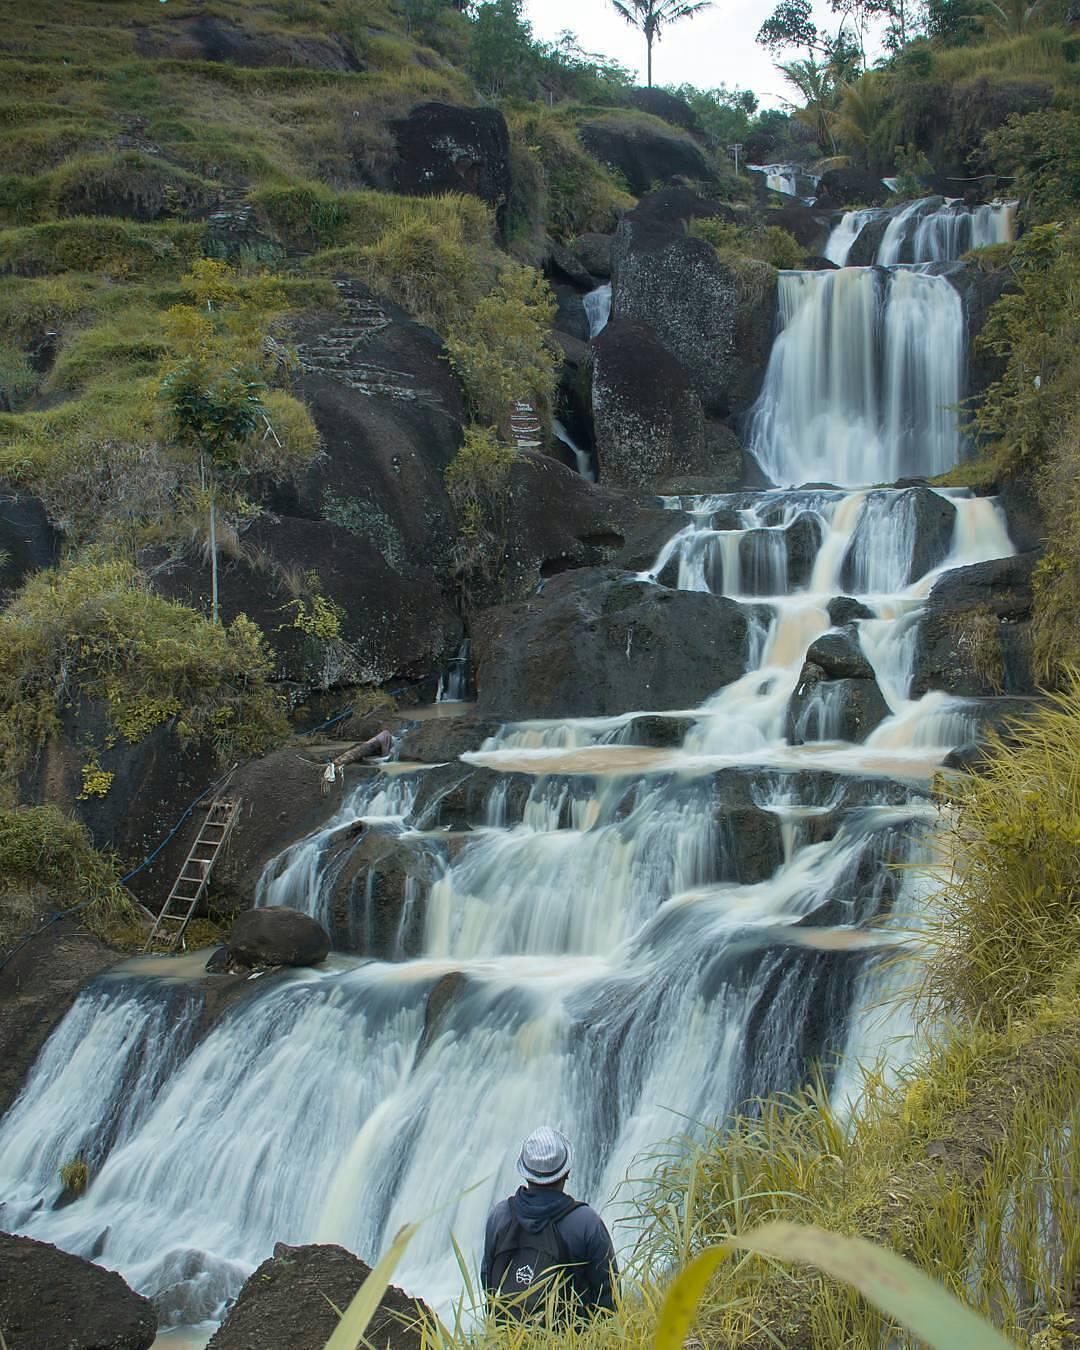 Pesona Air Terjun Kedung Kandang Kab Gunungkidul